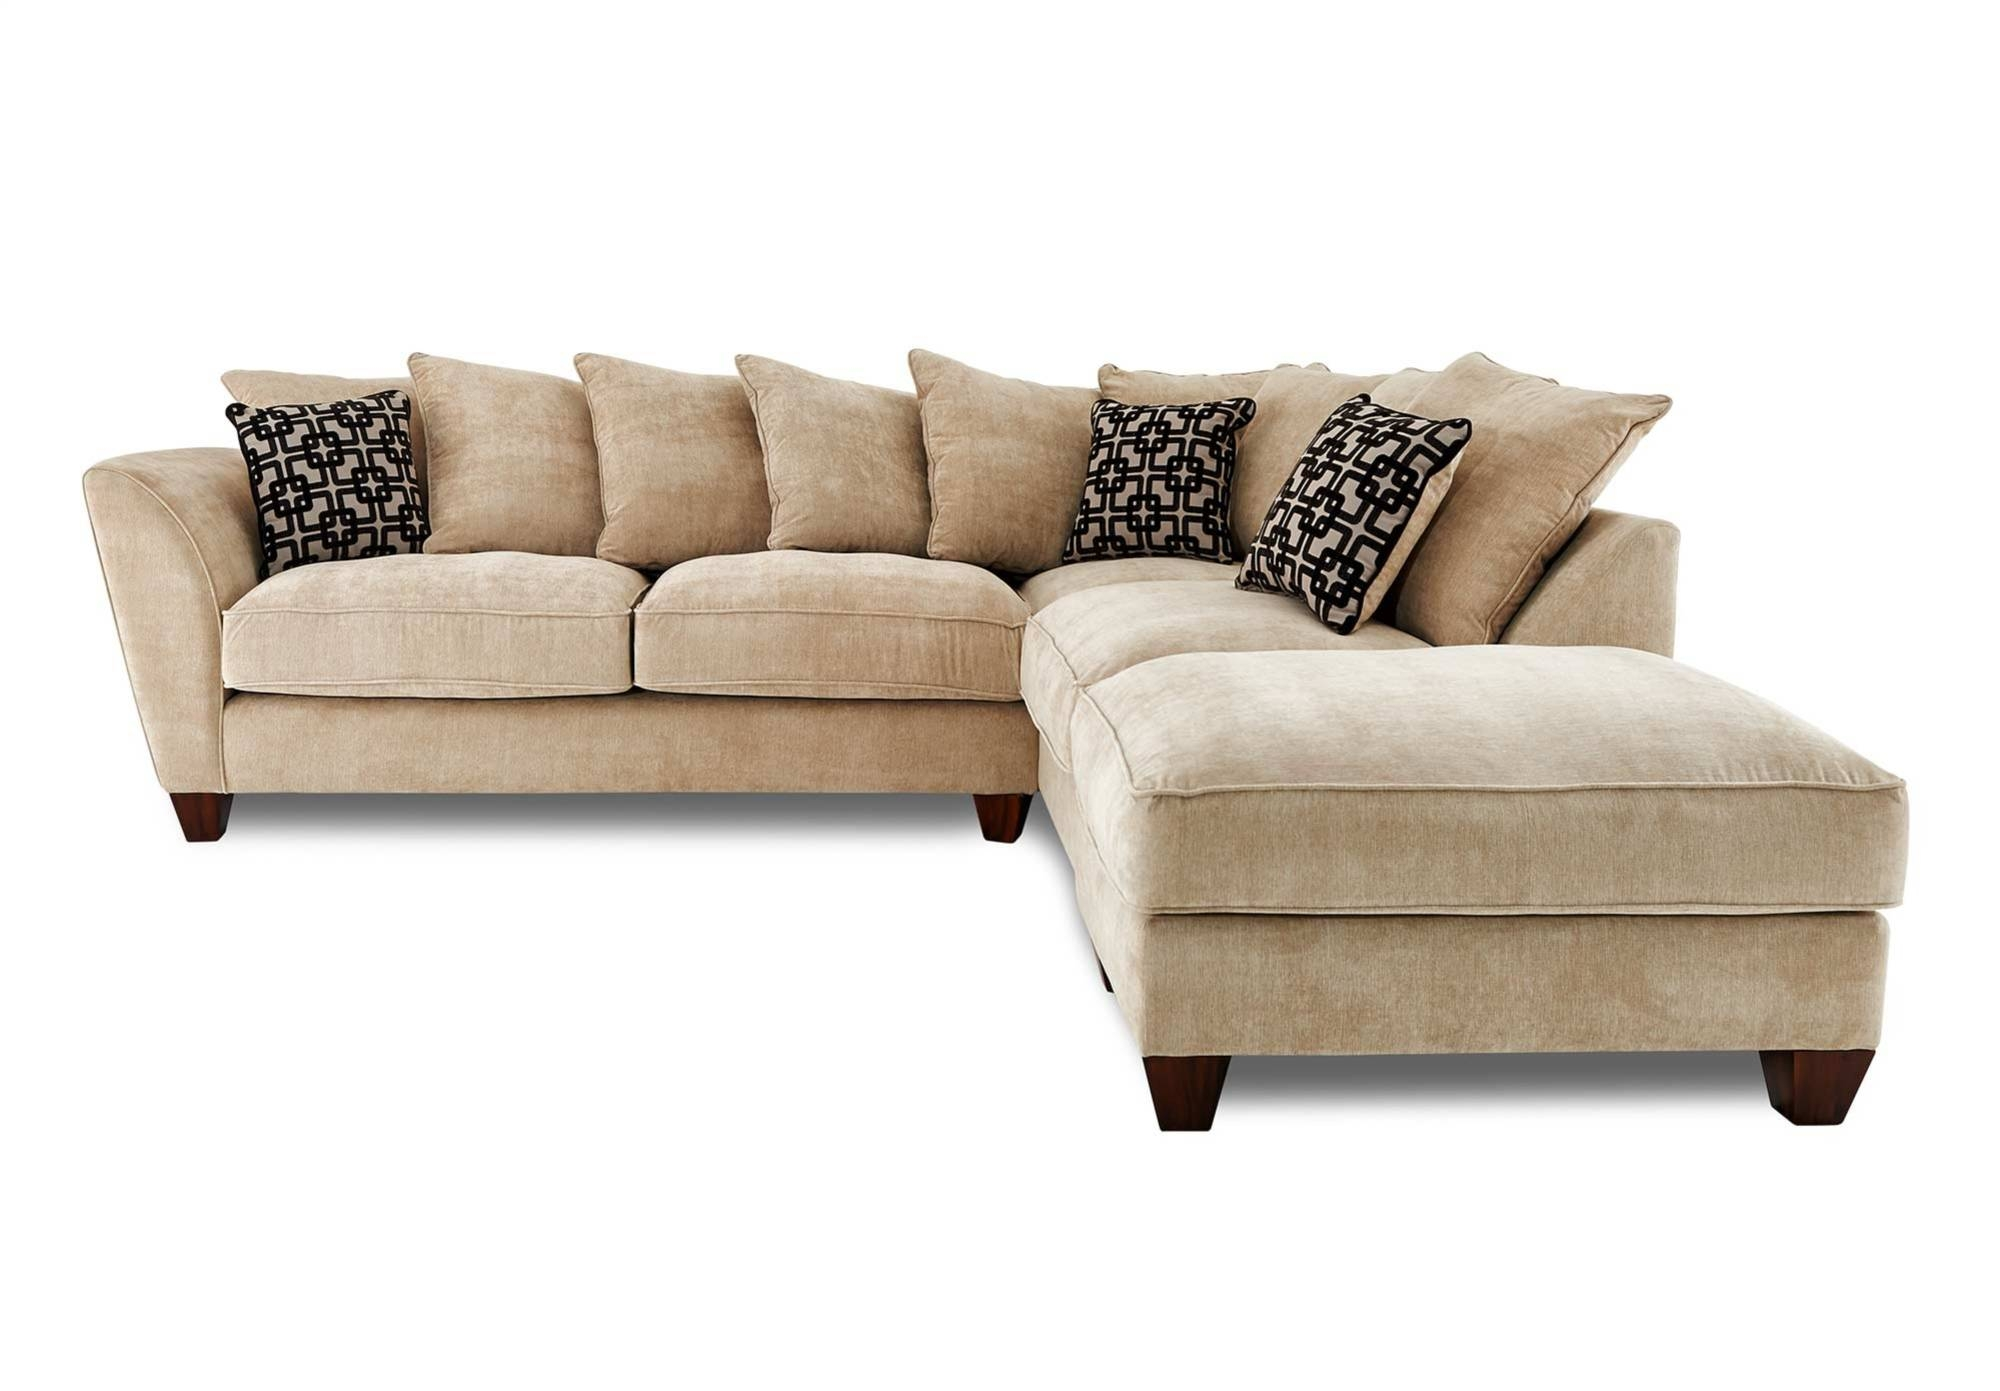 Popular Photo of Corner Sofa Chairs